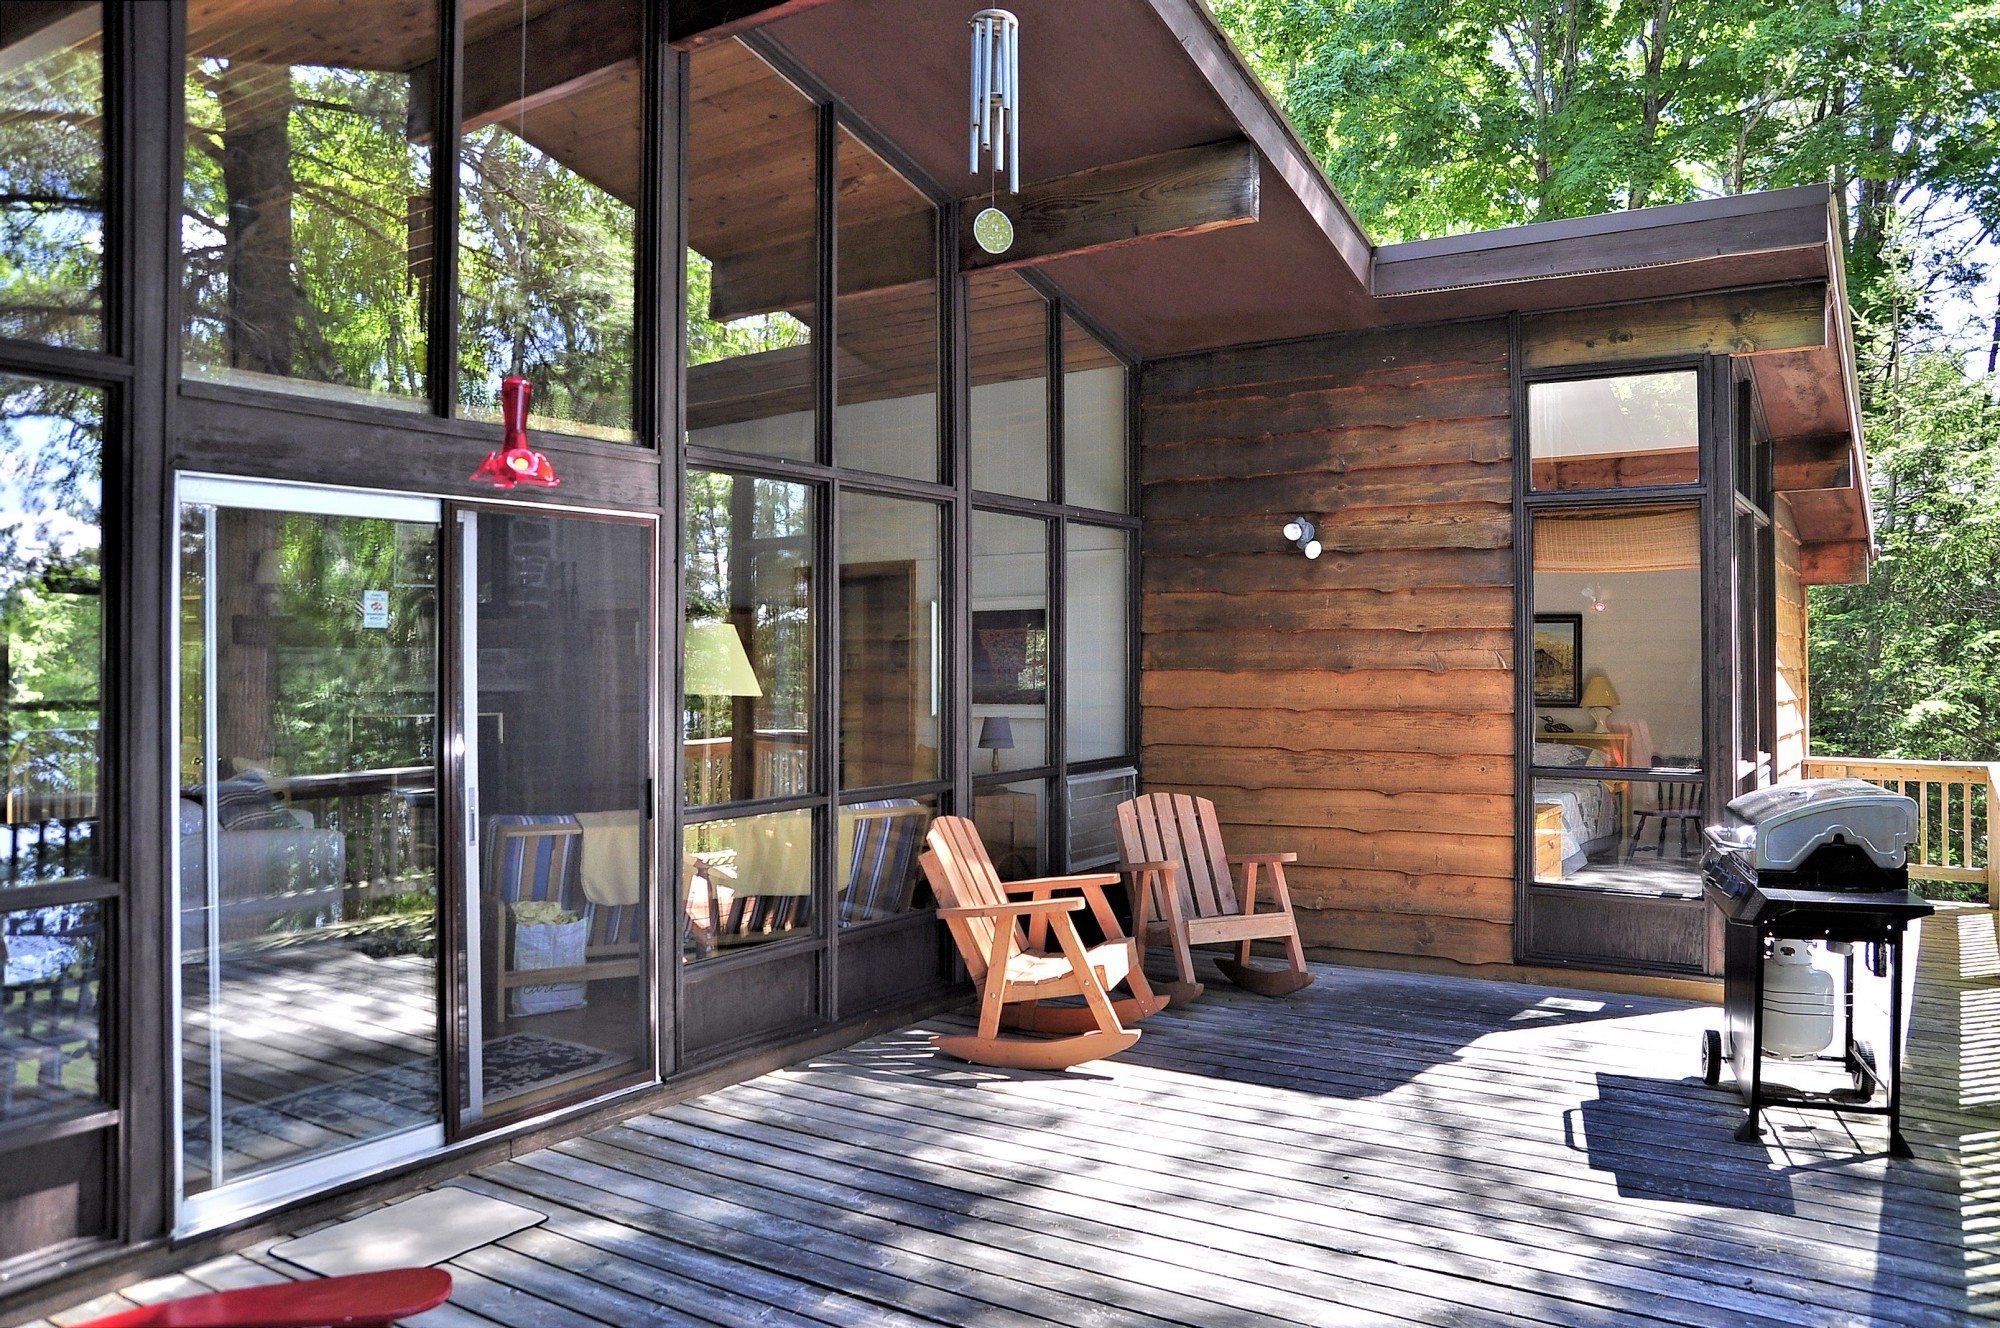 kawartha-lakes-cottage-for-sale-315-crego-lake-road-10